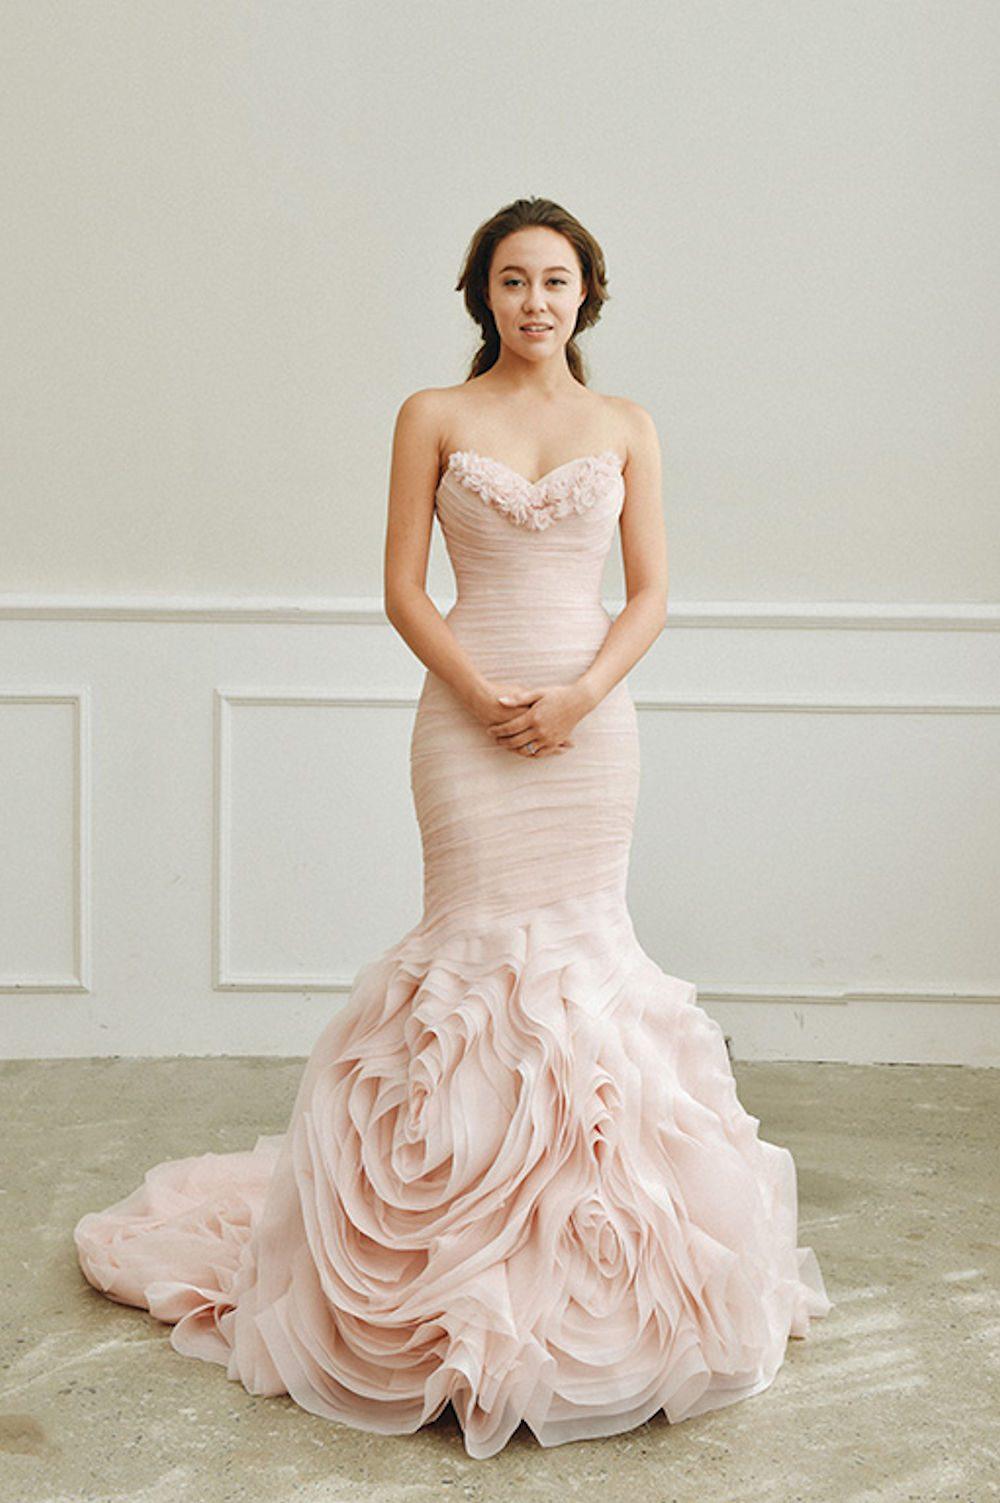 Kim Alpha Bridal - Wedding Dress Melbourne - Arcata Line Blush Pink Wedding Dress